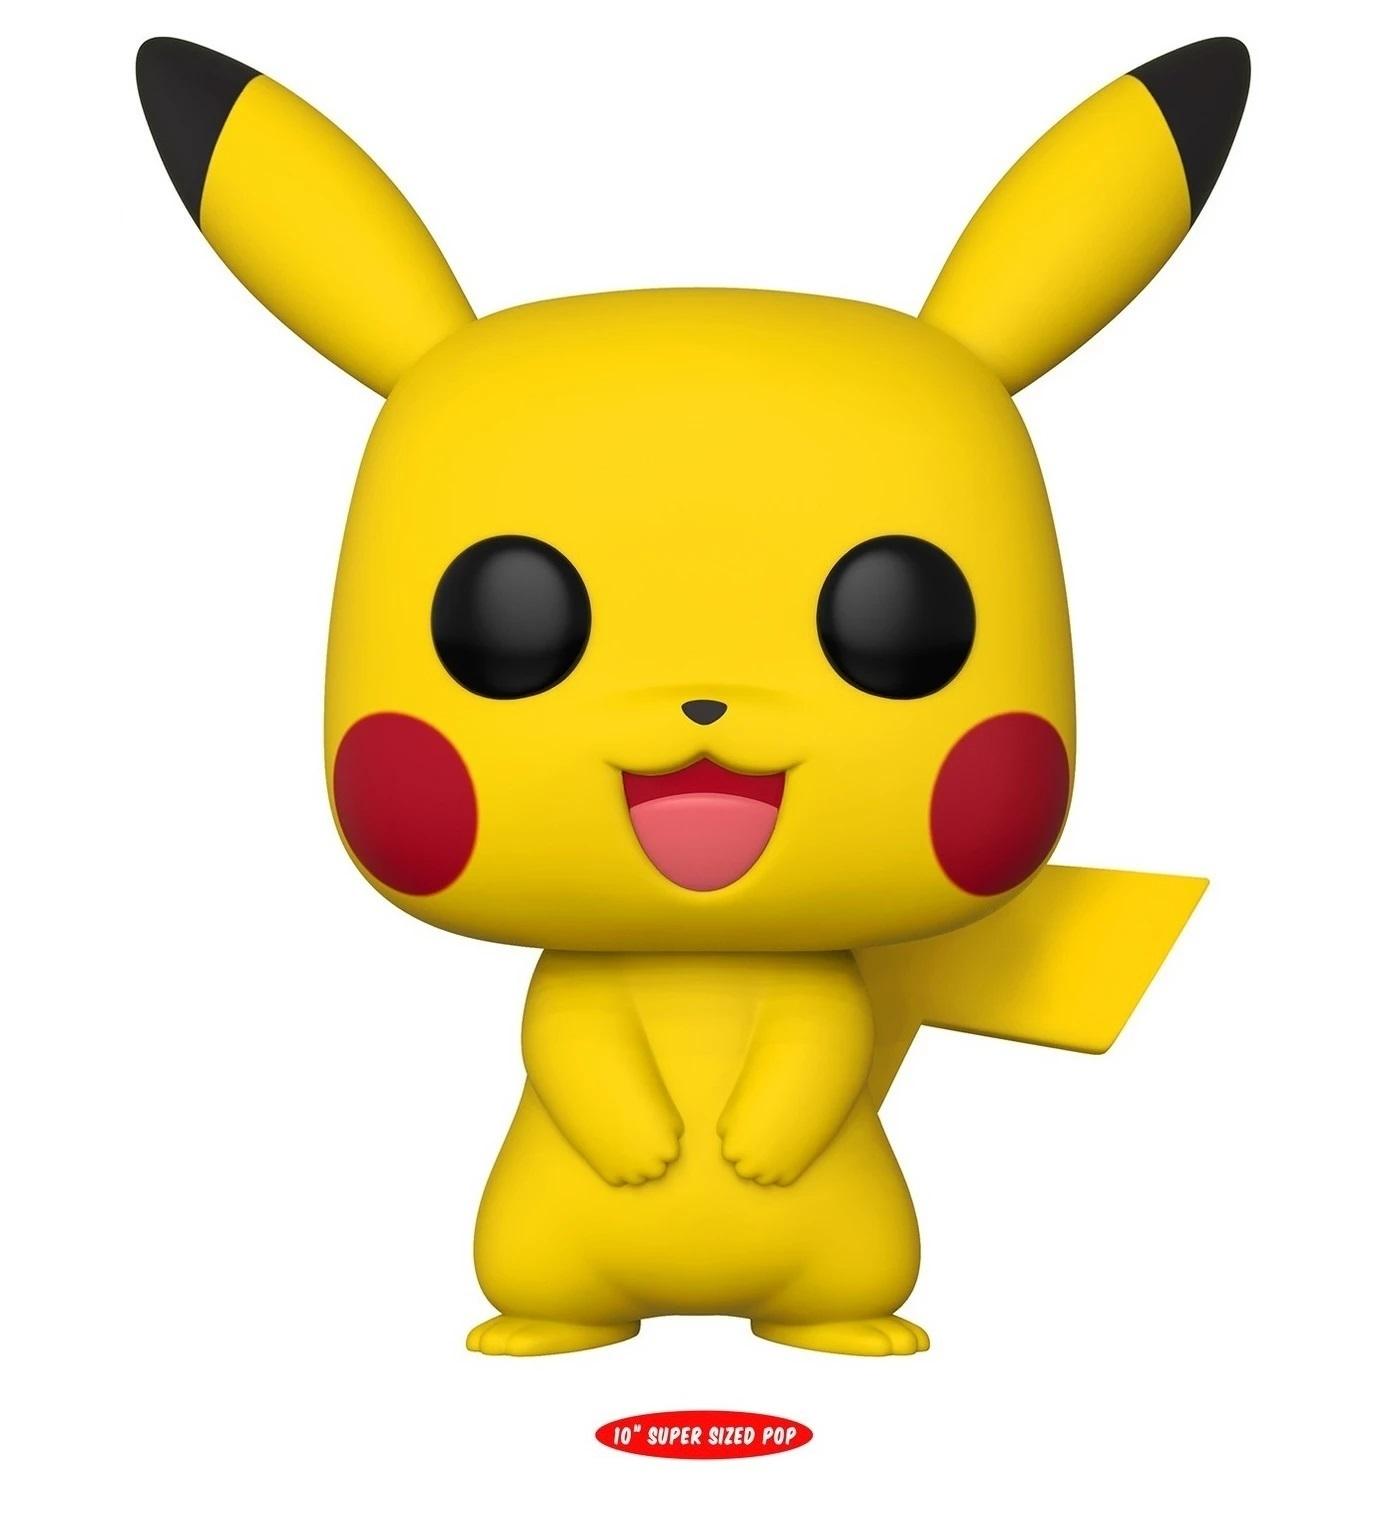 Pokemon Pikachu 10 Super Sized Pop Vinyl Figure